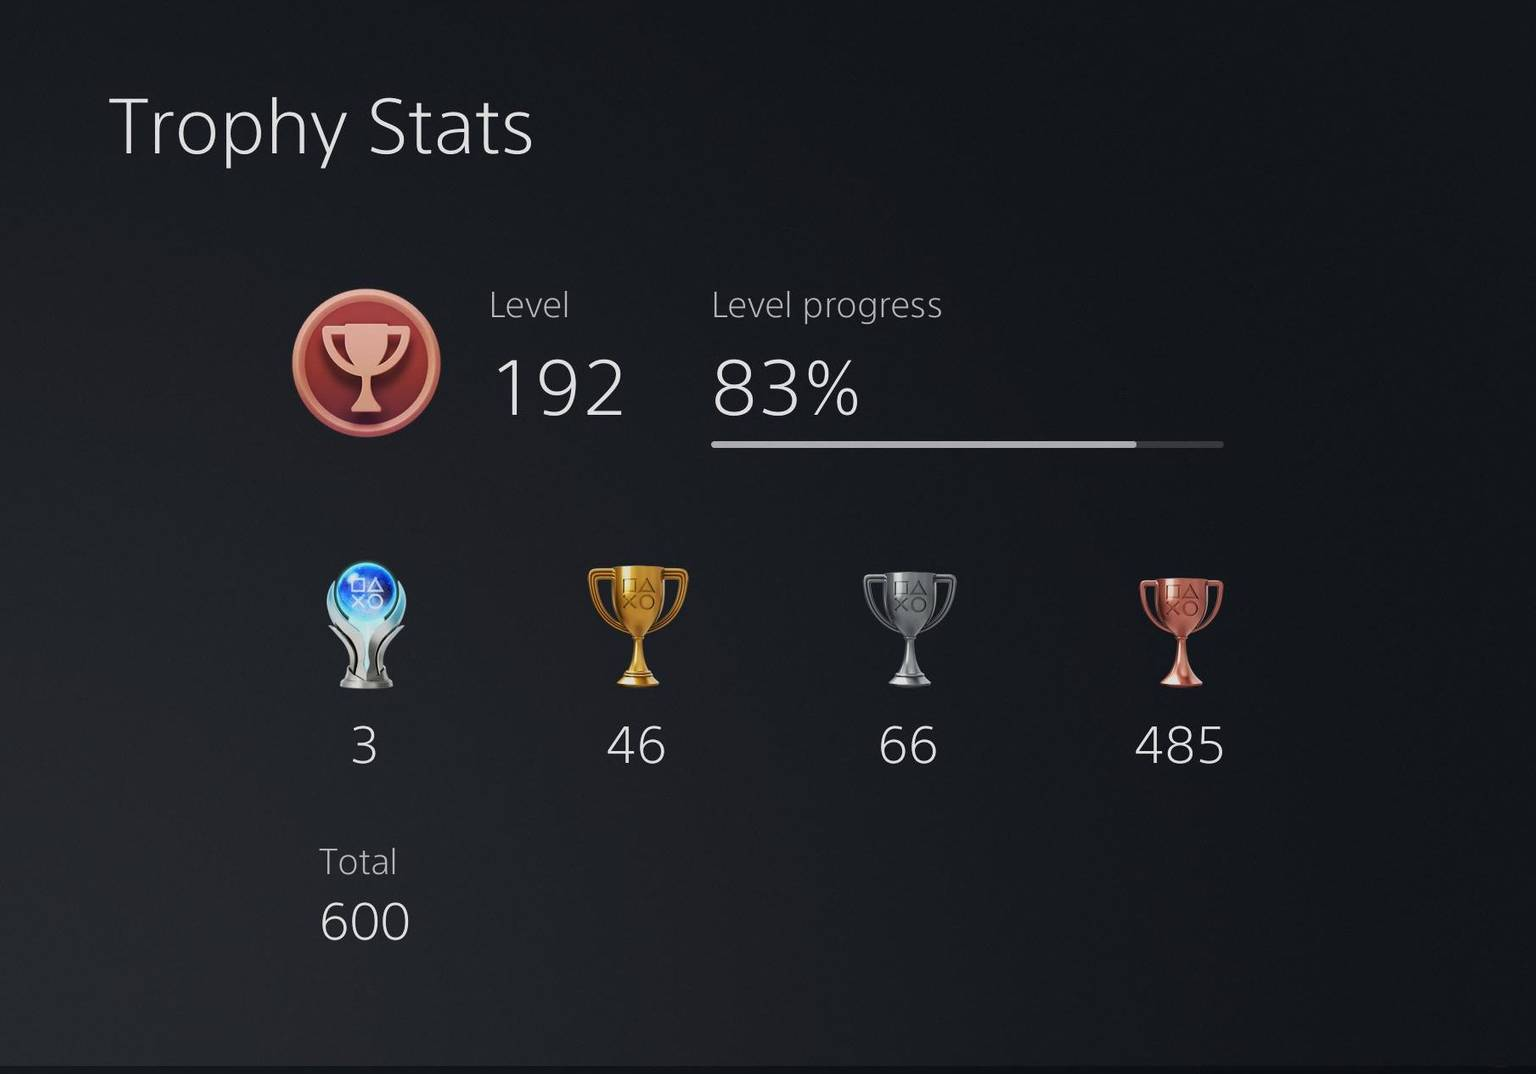 Eng Trophy Stats.jpg?fit=1024,716&zoom=1